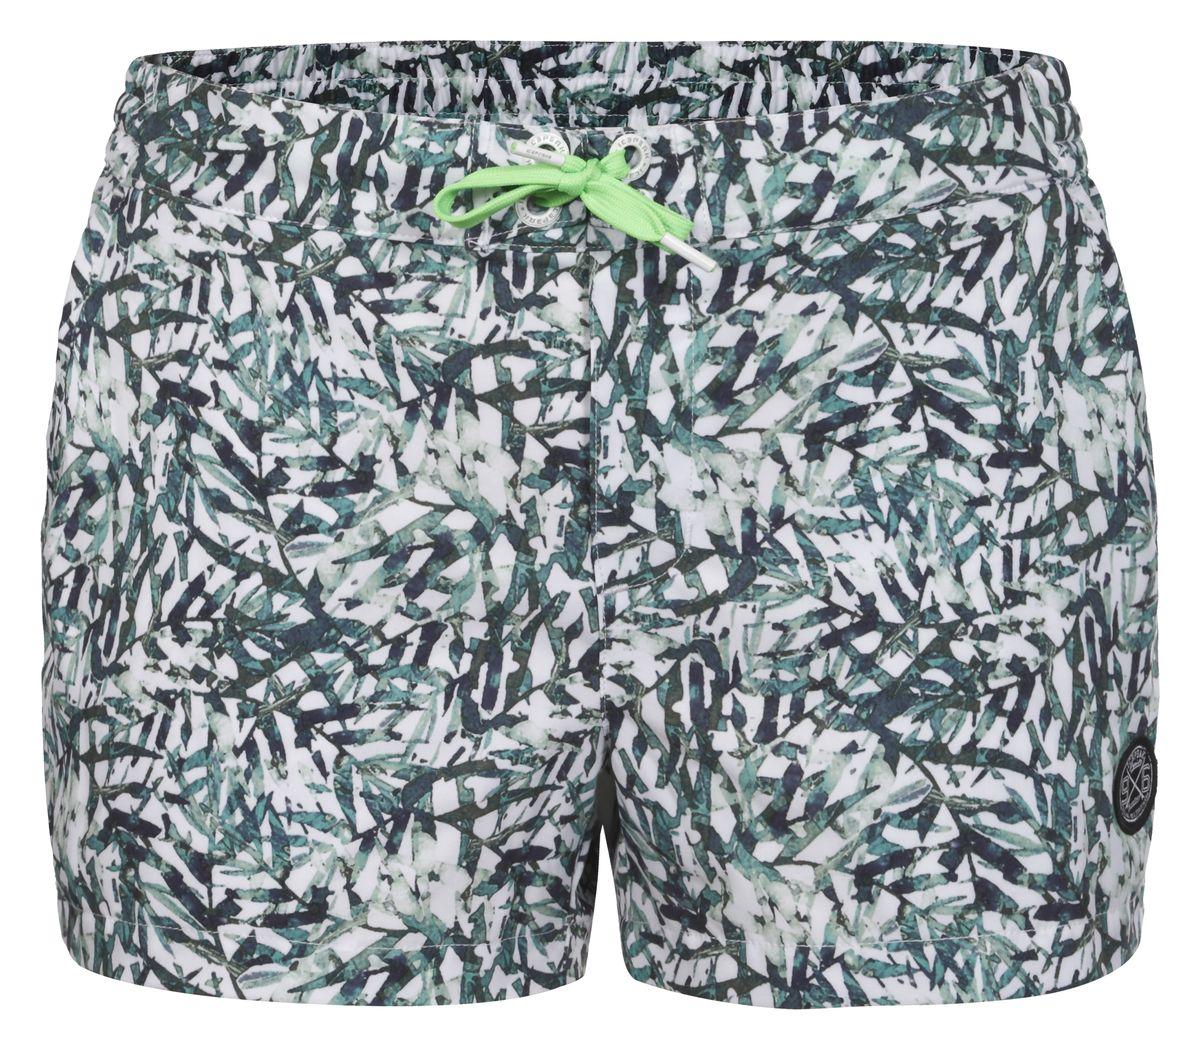 Шорты для плавания женские Icepeak Manon, цвет: зеленый, белый. 754528622IV. Размер 36 (42)